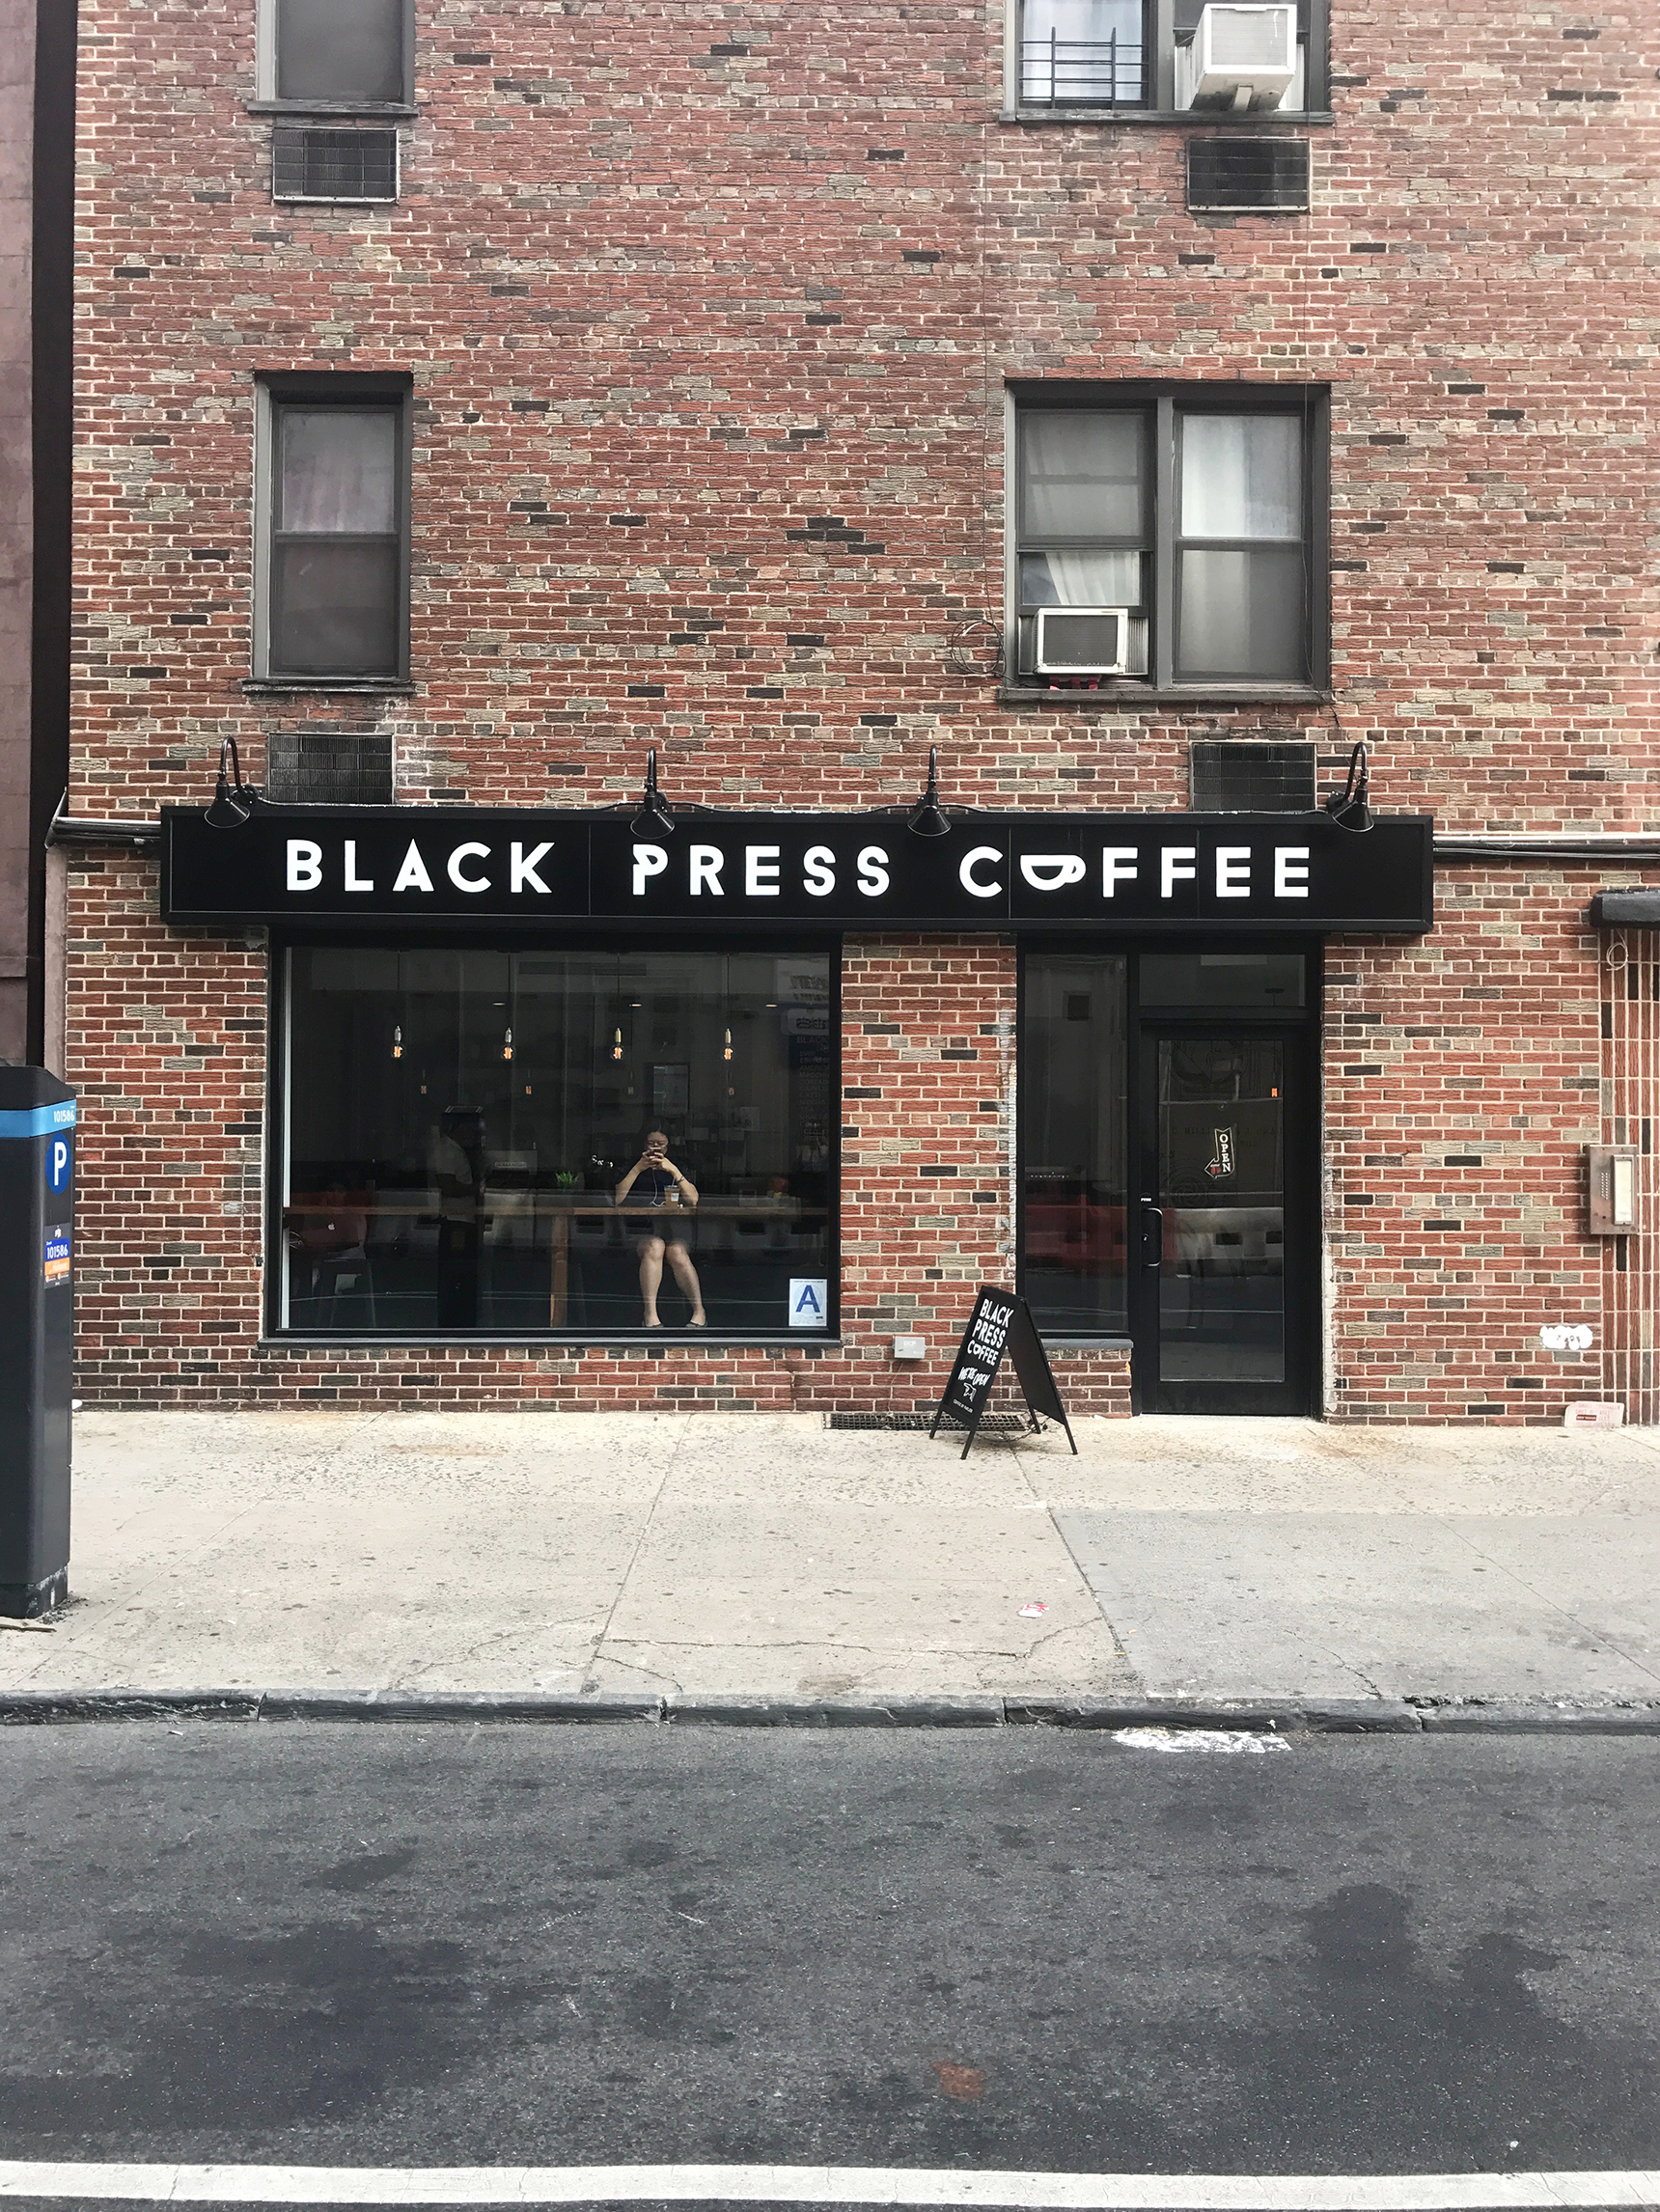 Black Press Coffee